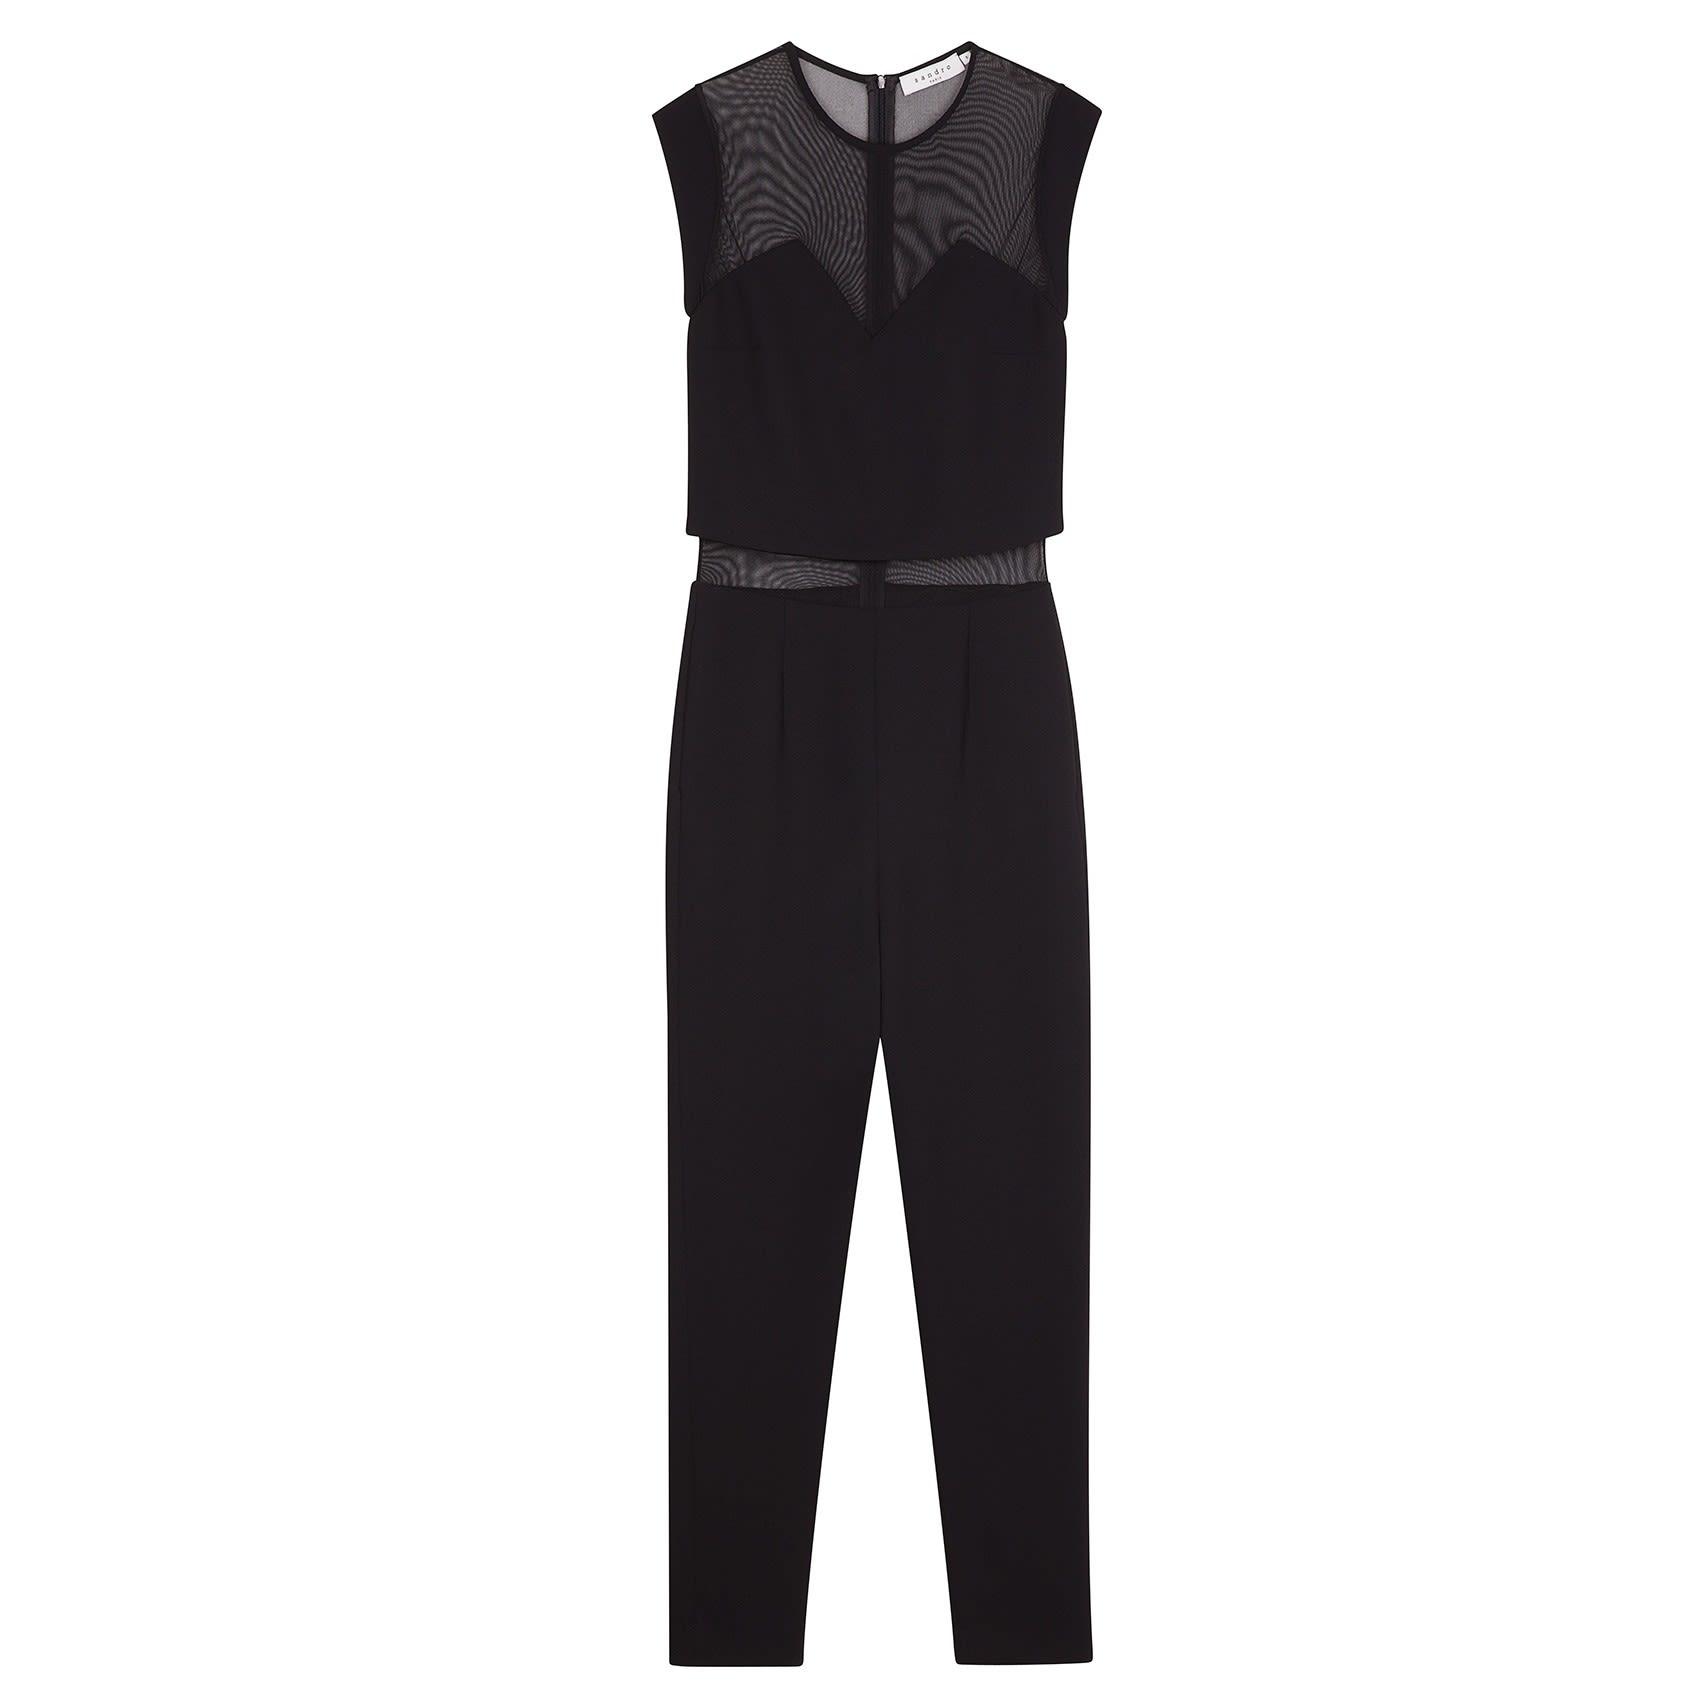 2c5ee5d17437 Sandro Pessy Crop Top Jumpsuit